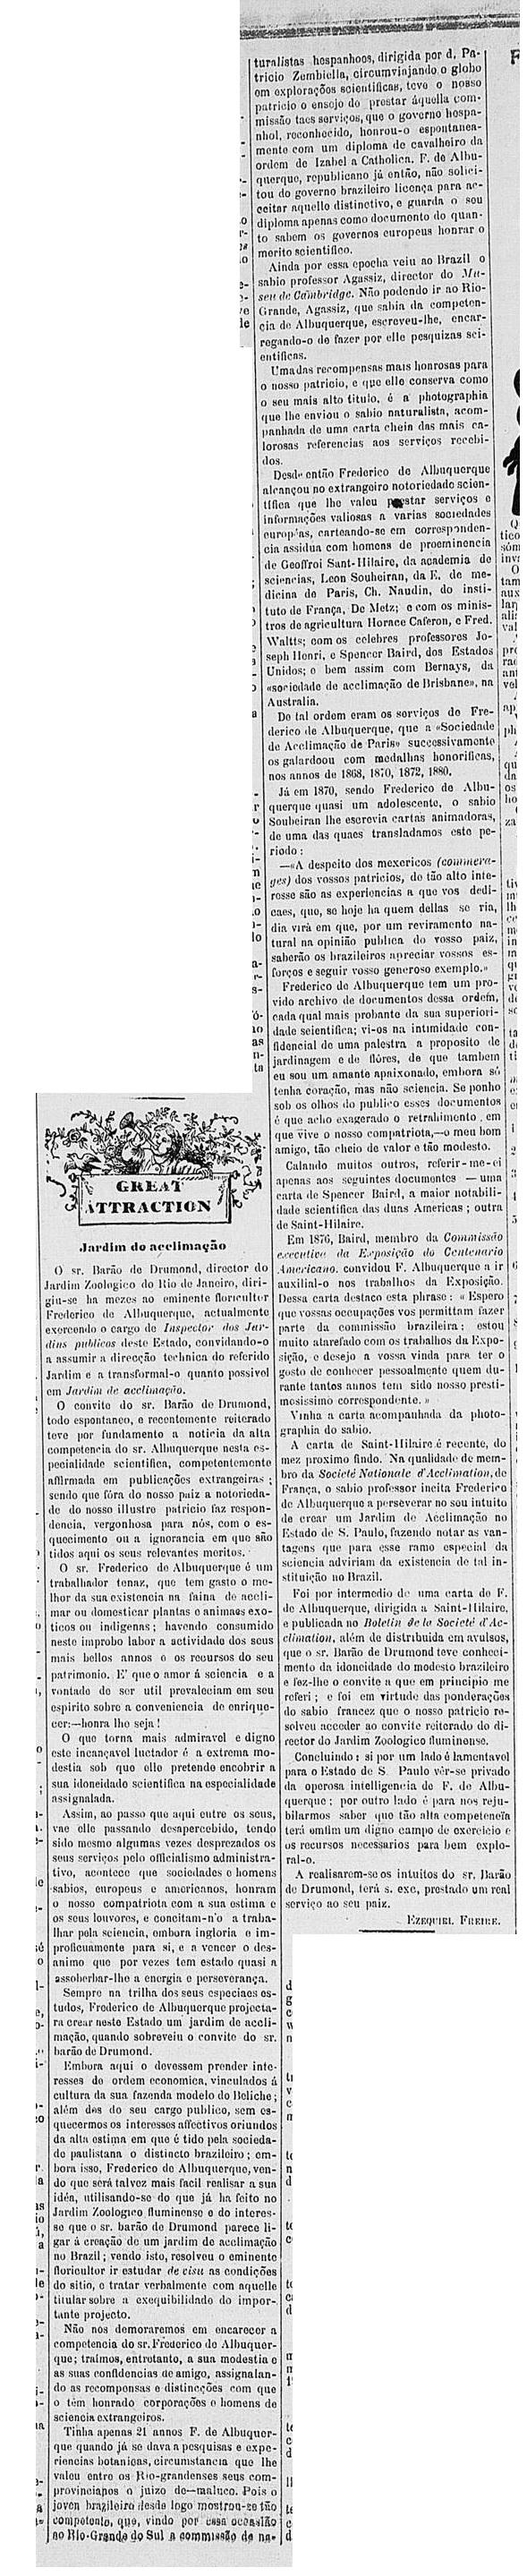 Correio Paulistano _ 30 julho 1890